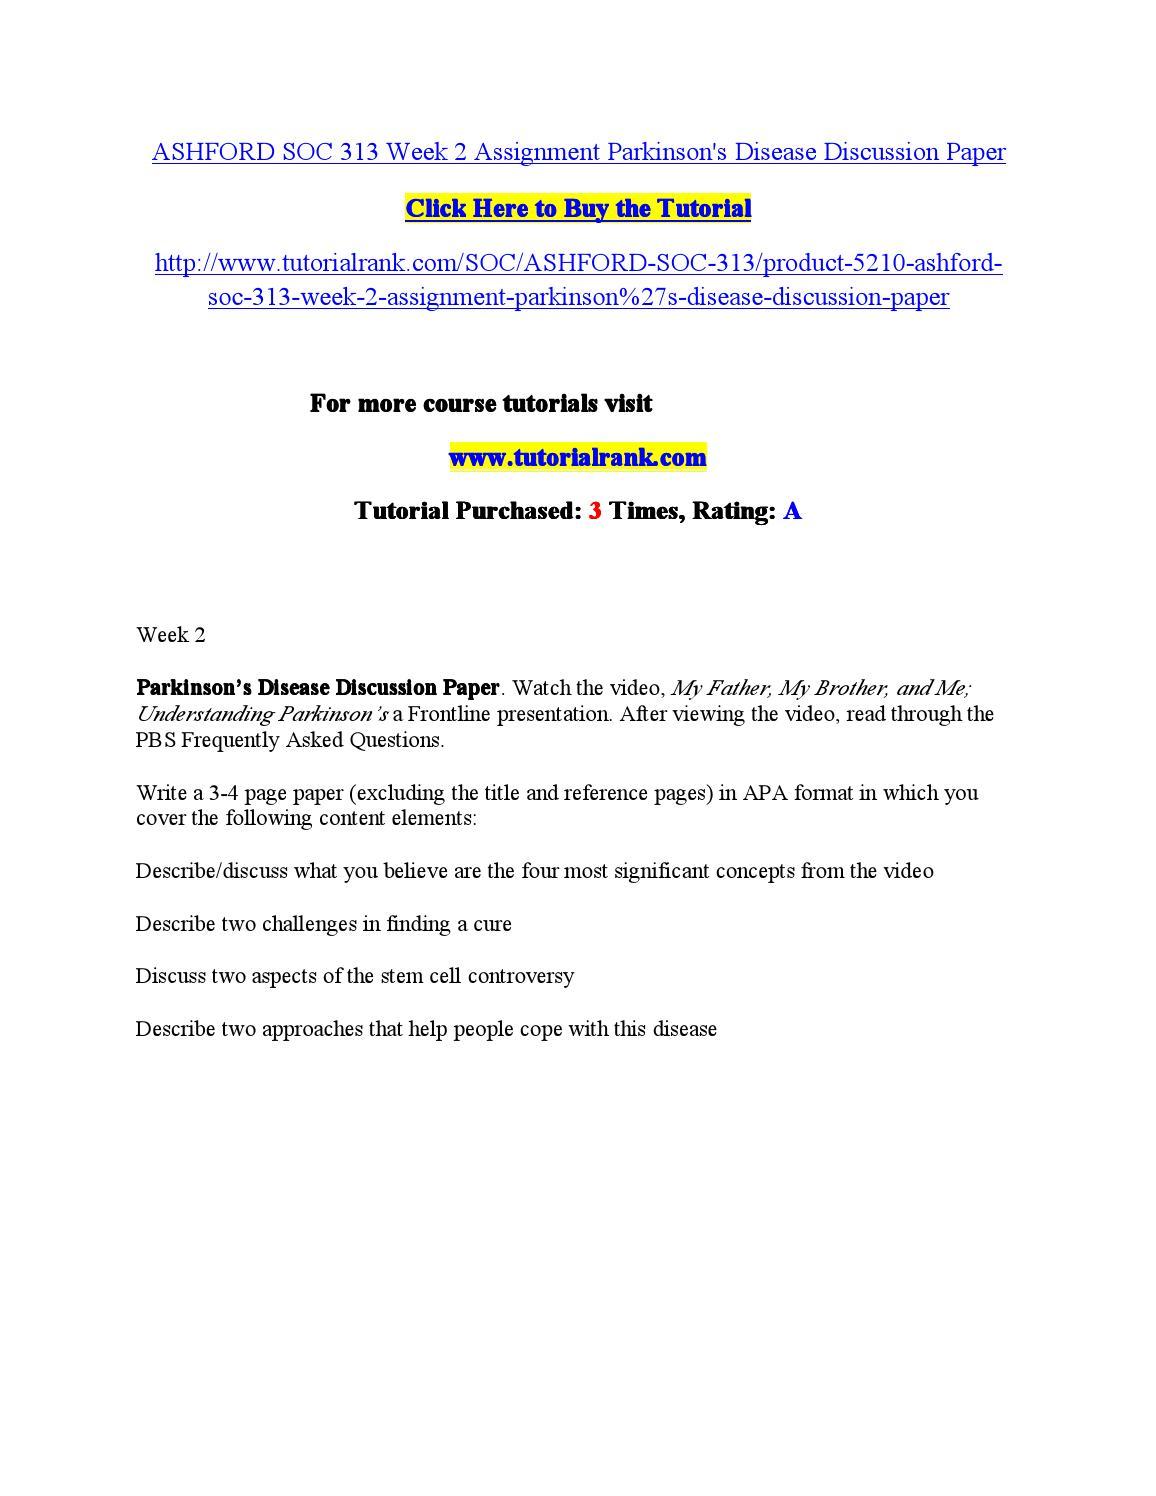 Ashford soc 312 week 1 discussions